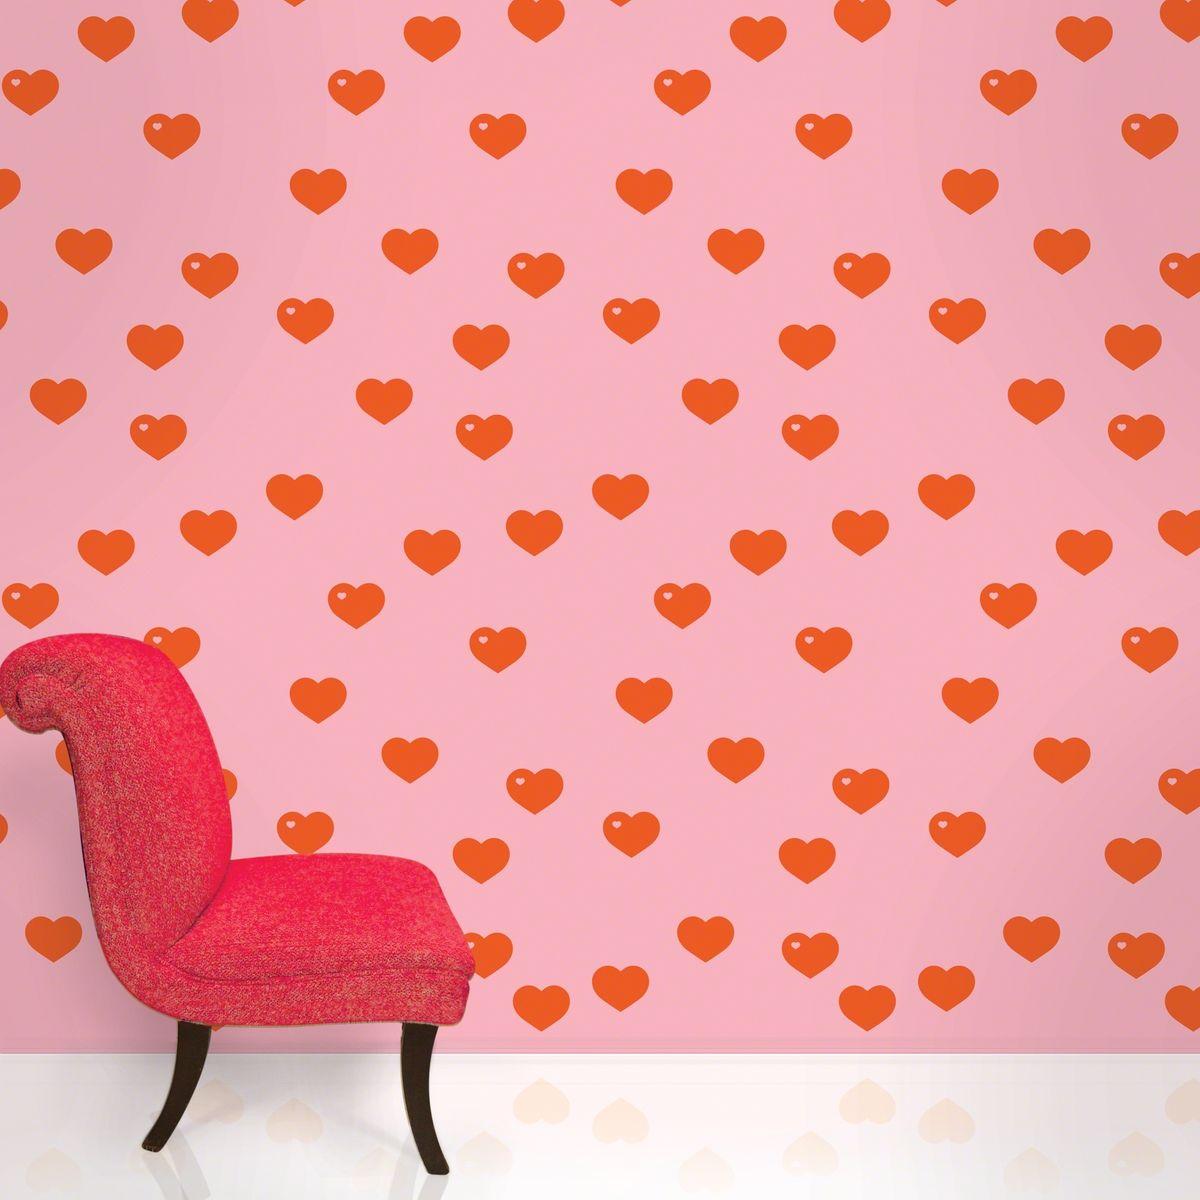 Arthome 31 6 Square Feet Distressed Red Brick Decorative Self Adhesive Peel And Stick Wallpaper Decor Vinyl Wall Covering Brick Wallpaper Red Brick Wallpaper